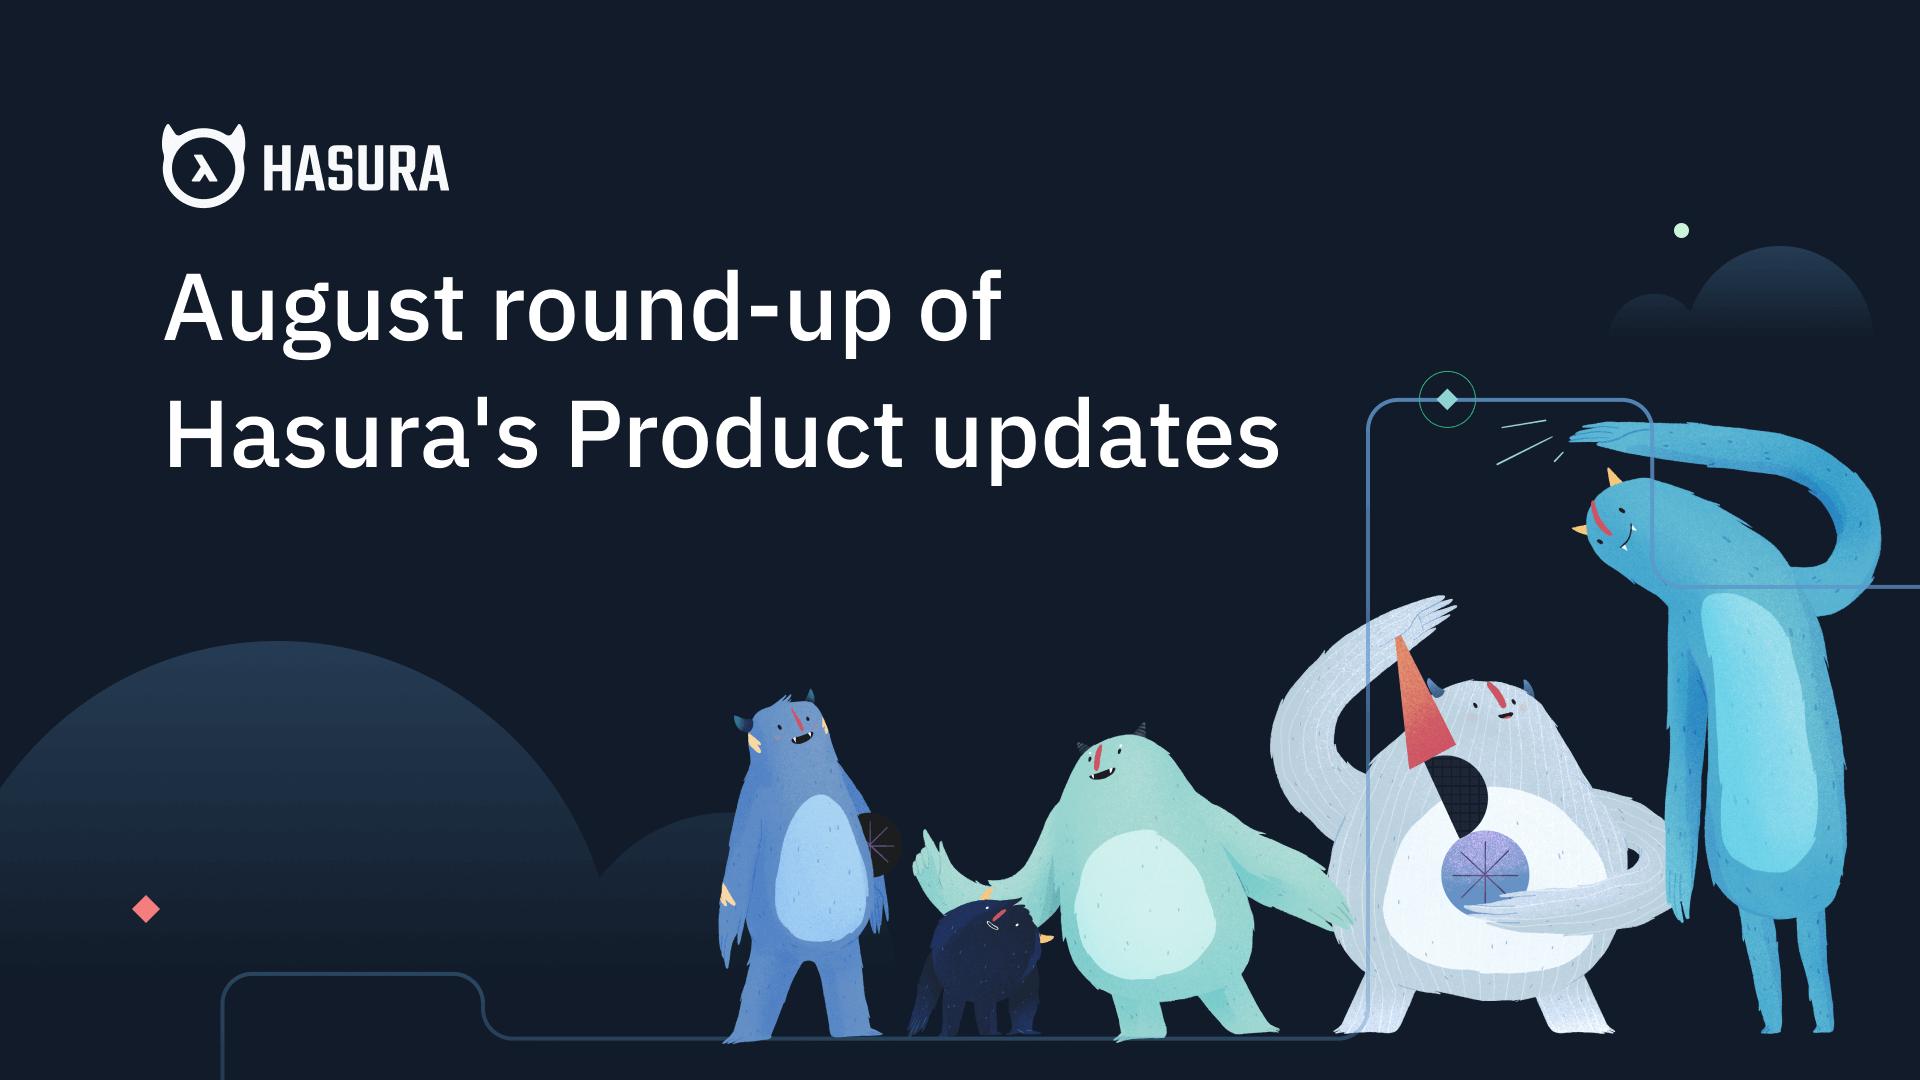 Hasura Product Updates: August Round-up